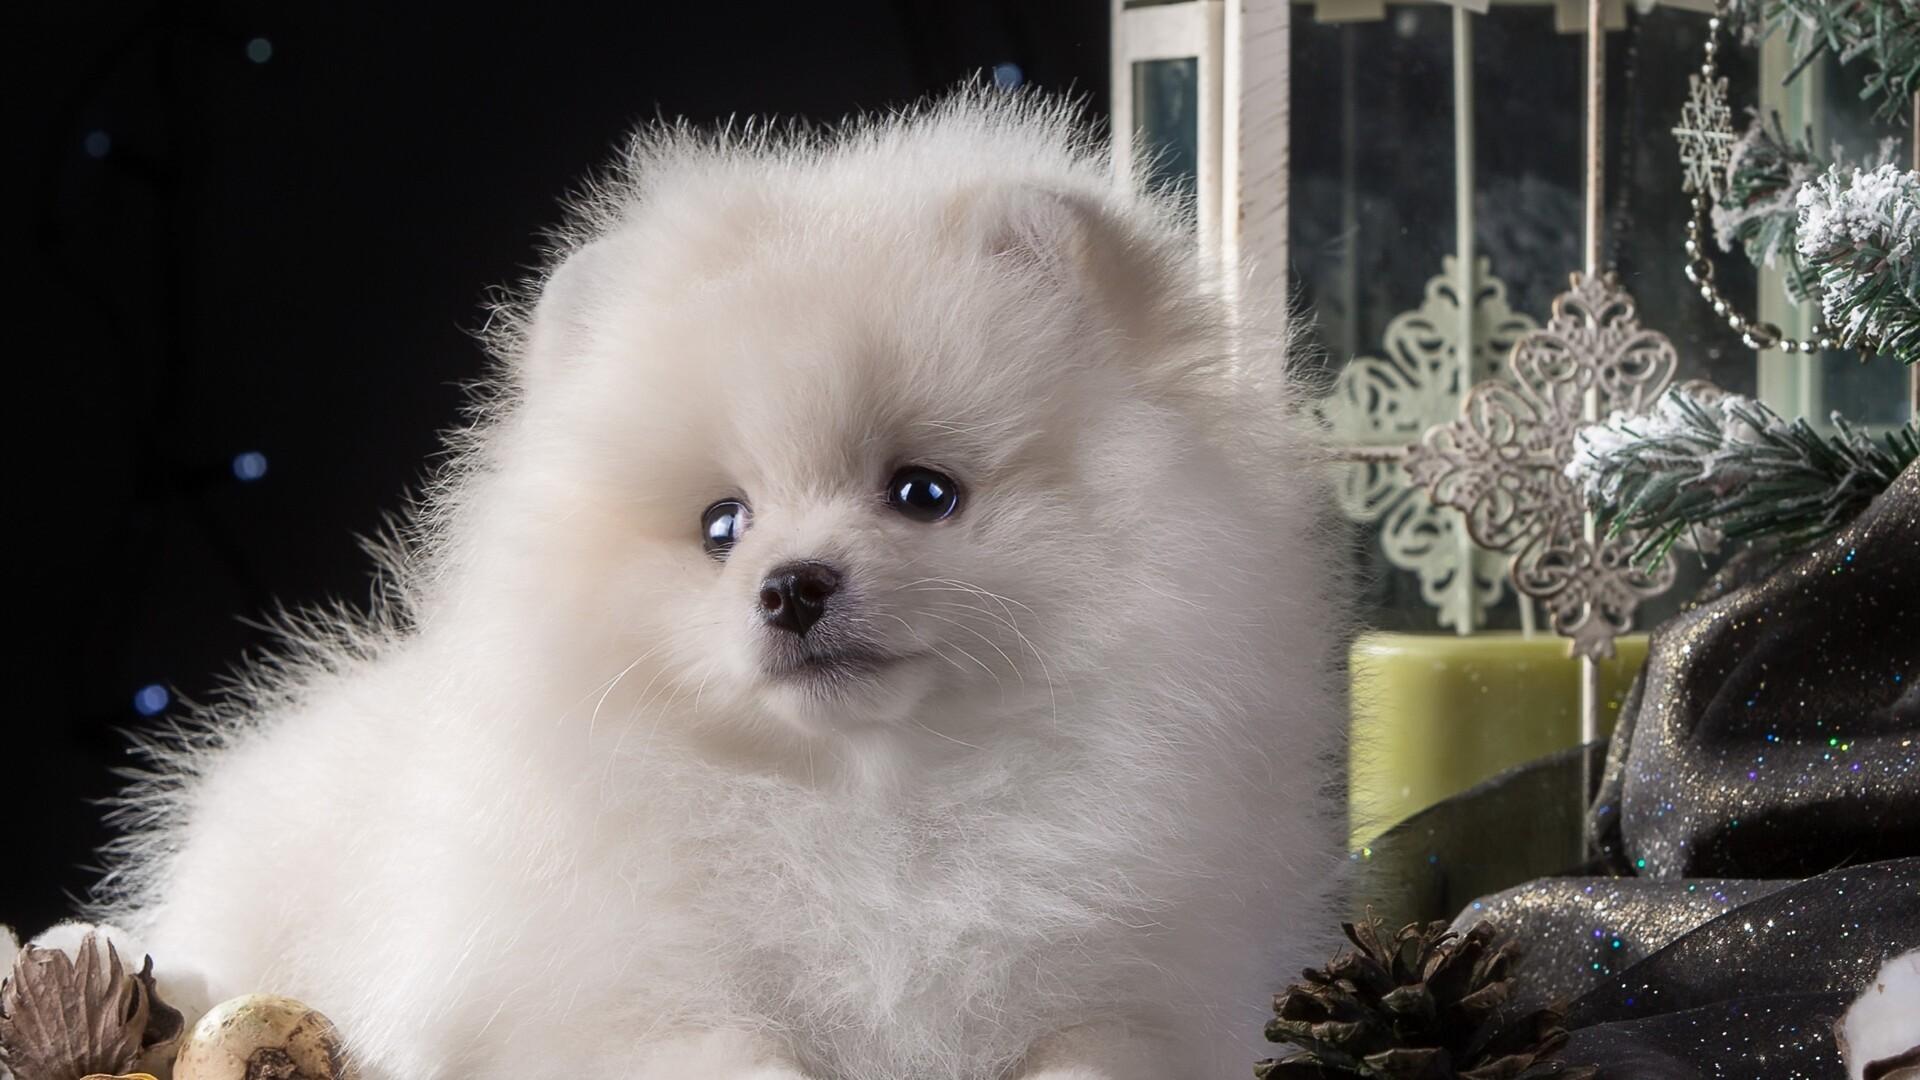 1920x1080 Puppy White Cute Laptop Full HD 1080P HD 4k ...